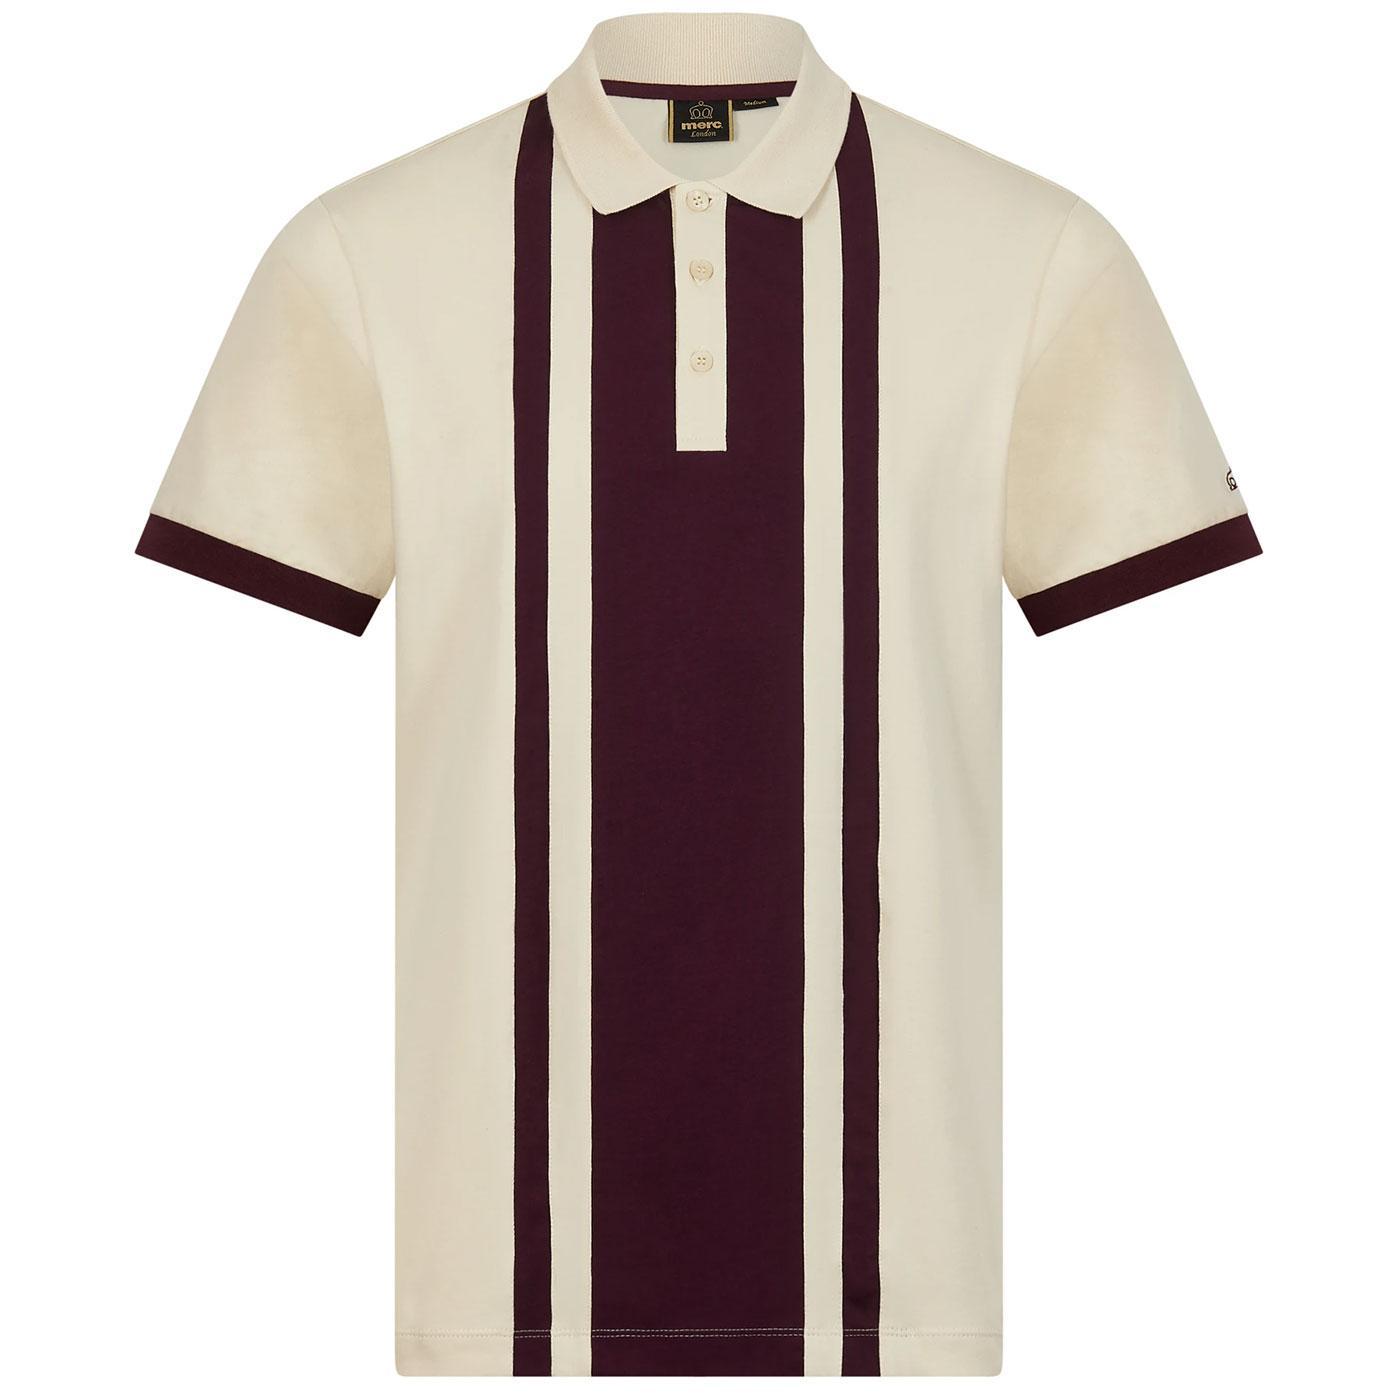 Fry MERC Retro Veritcal Cut & Sew Stripe Polo (I)